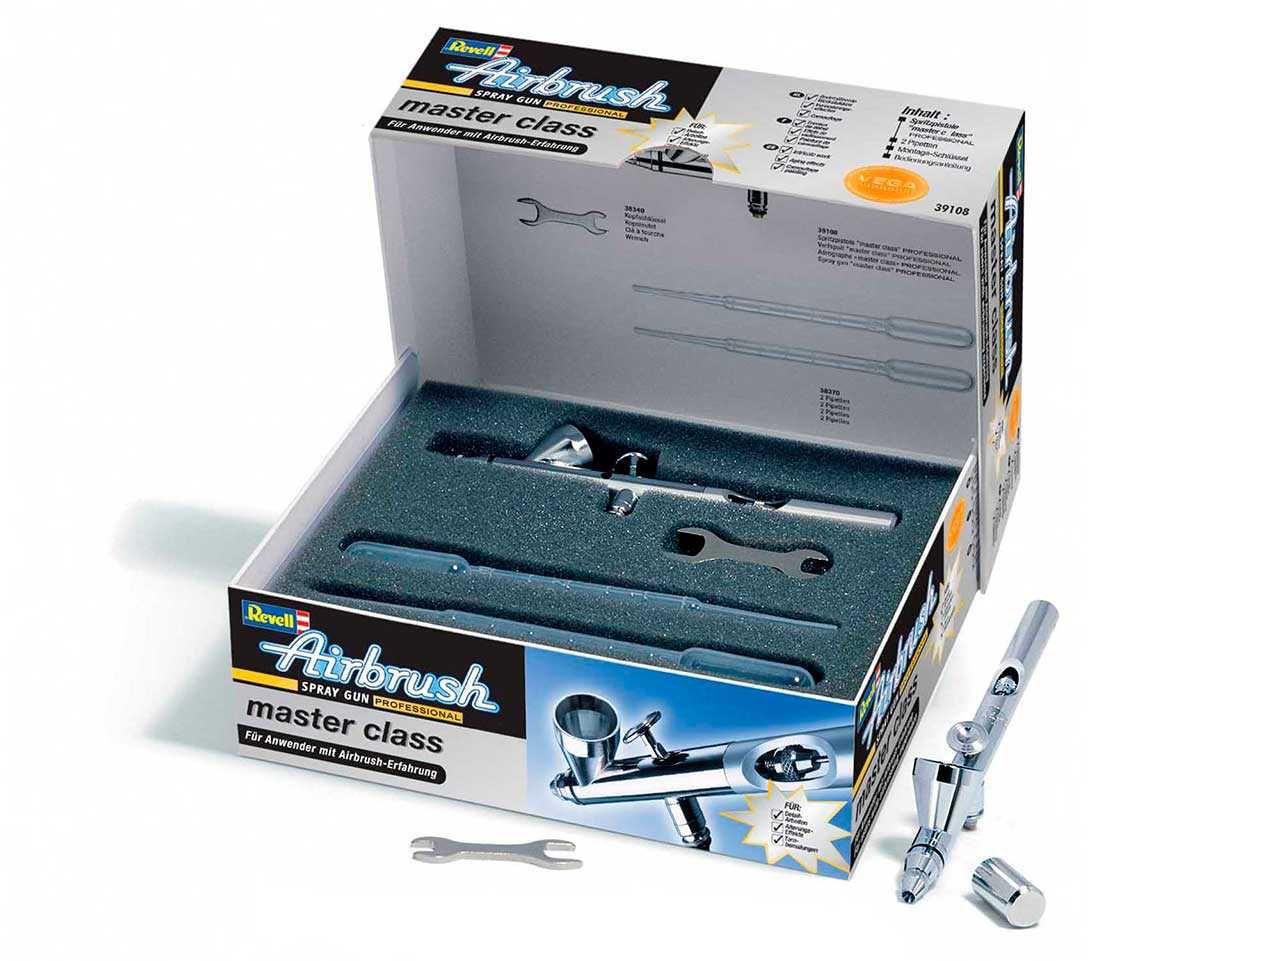 Airbrush Spray Gun 39108 - master class (Professional) Plastikové modely